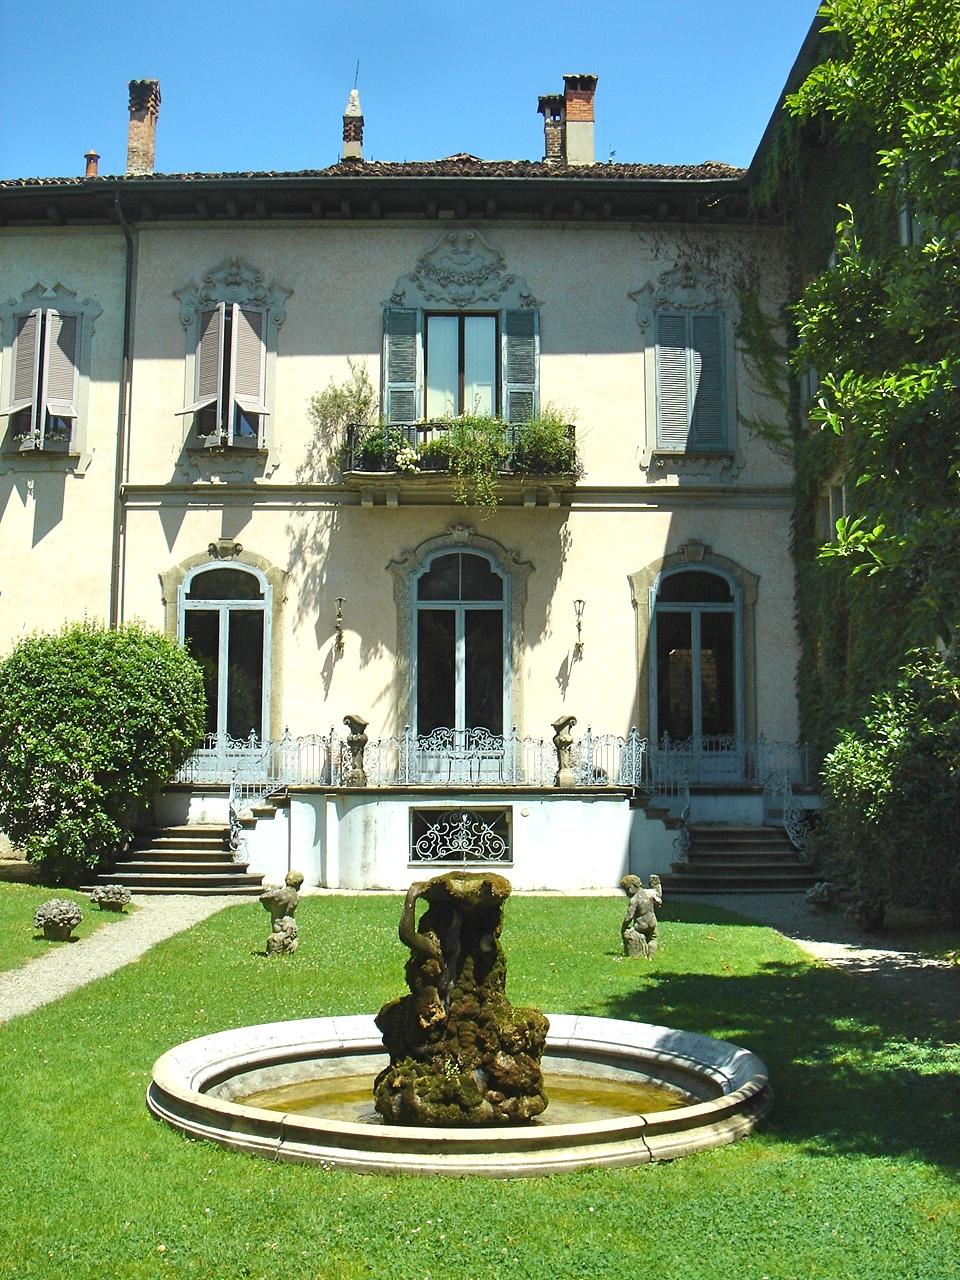 Rinasce la vigna di Leonardo, Milano